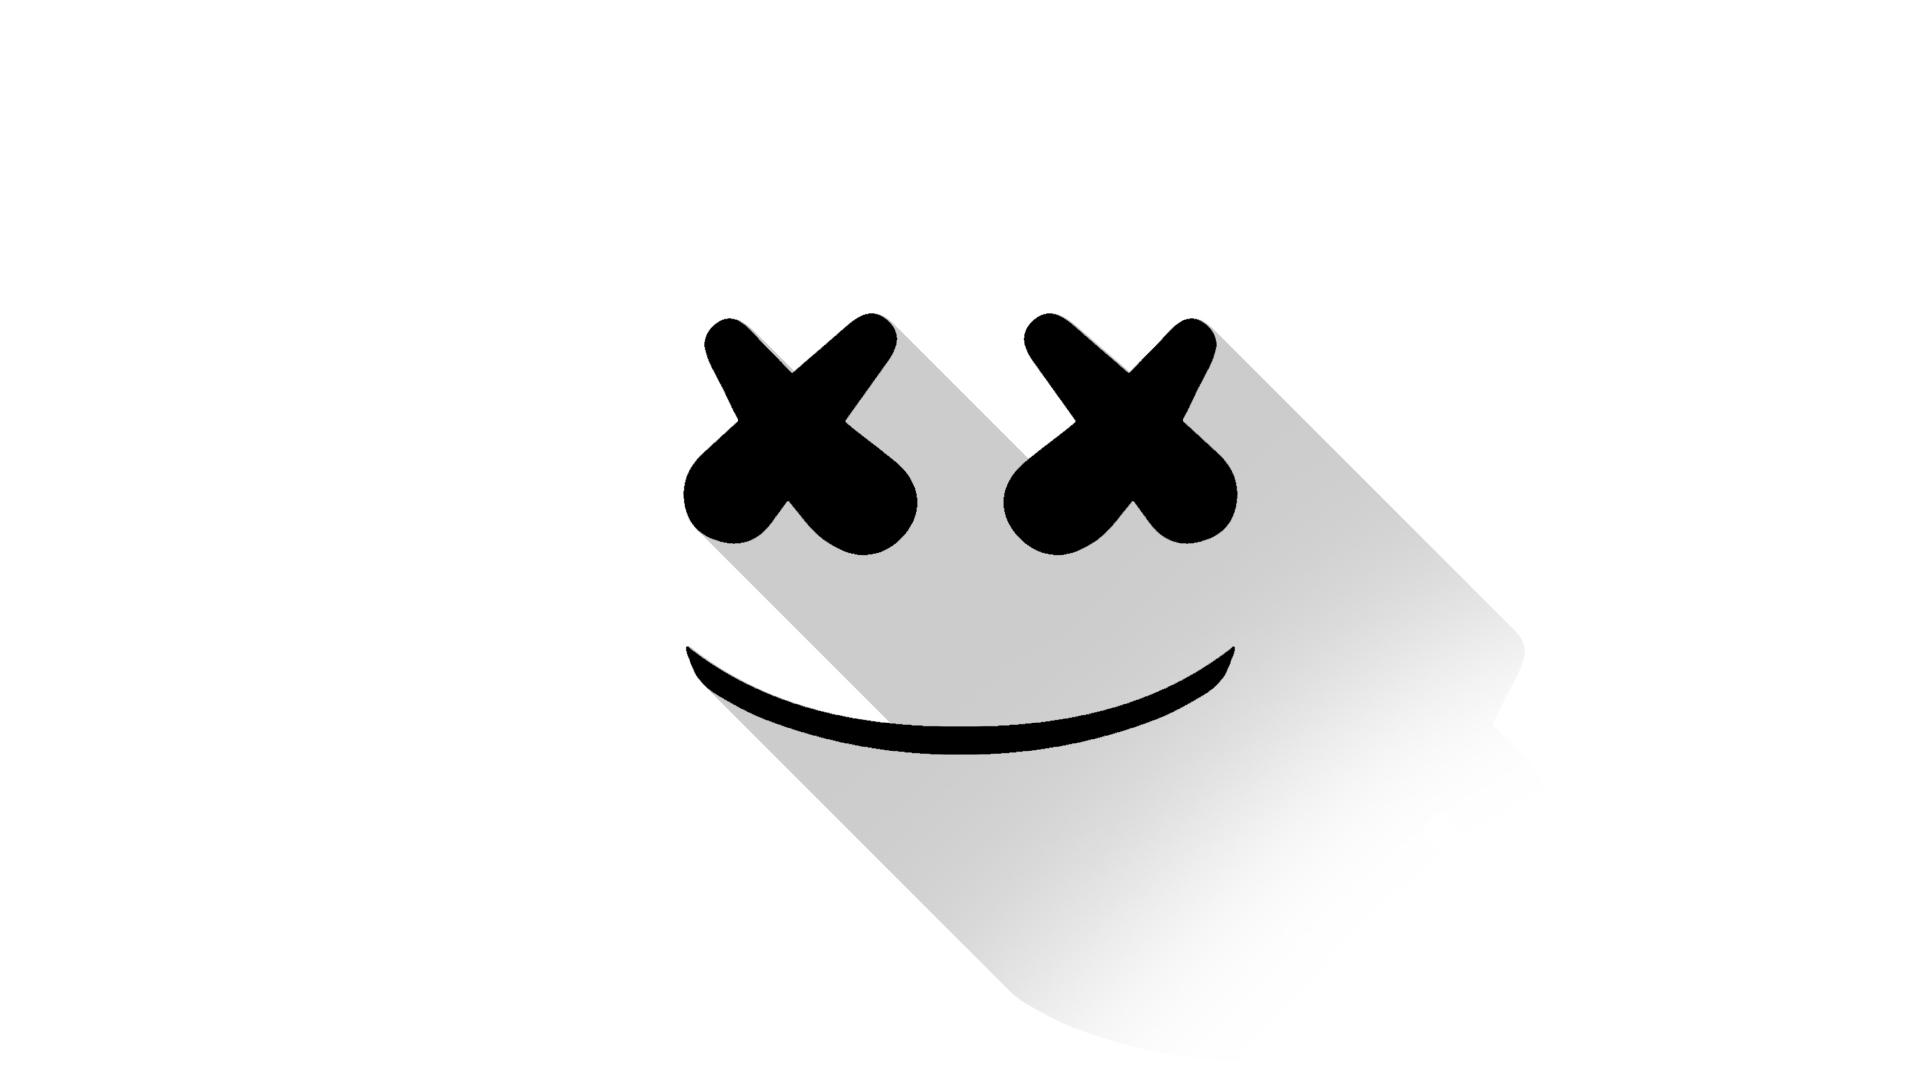 Cute Marshmallow Wallpaper Hd Marshmello Dj Material Design Logo Hd Music 4k